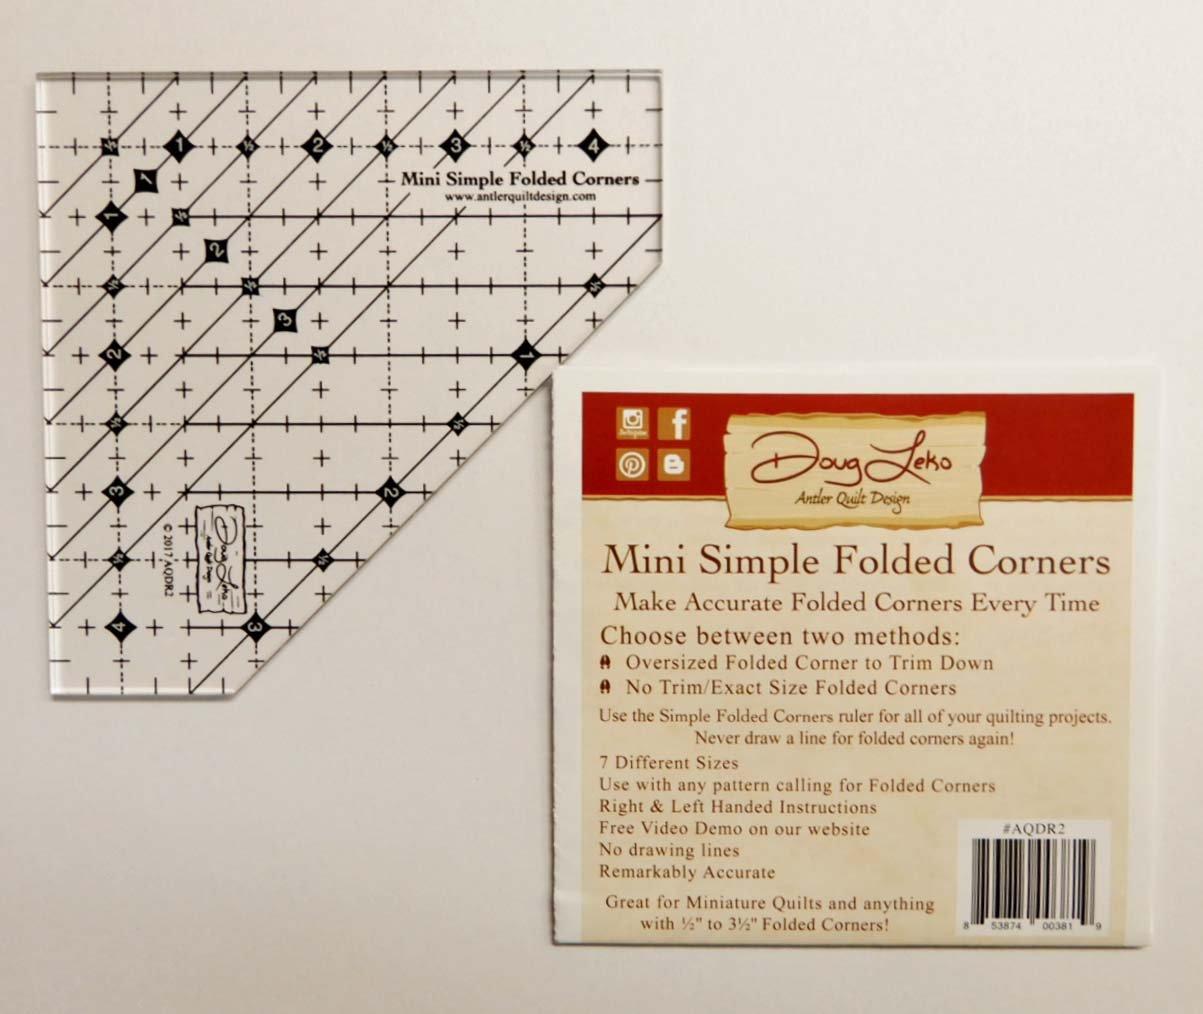 Doug Leko's Mini Simple Folded Corners Tool